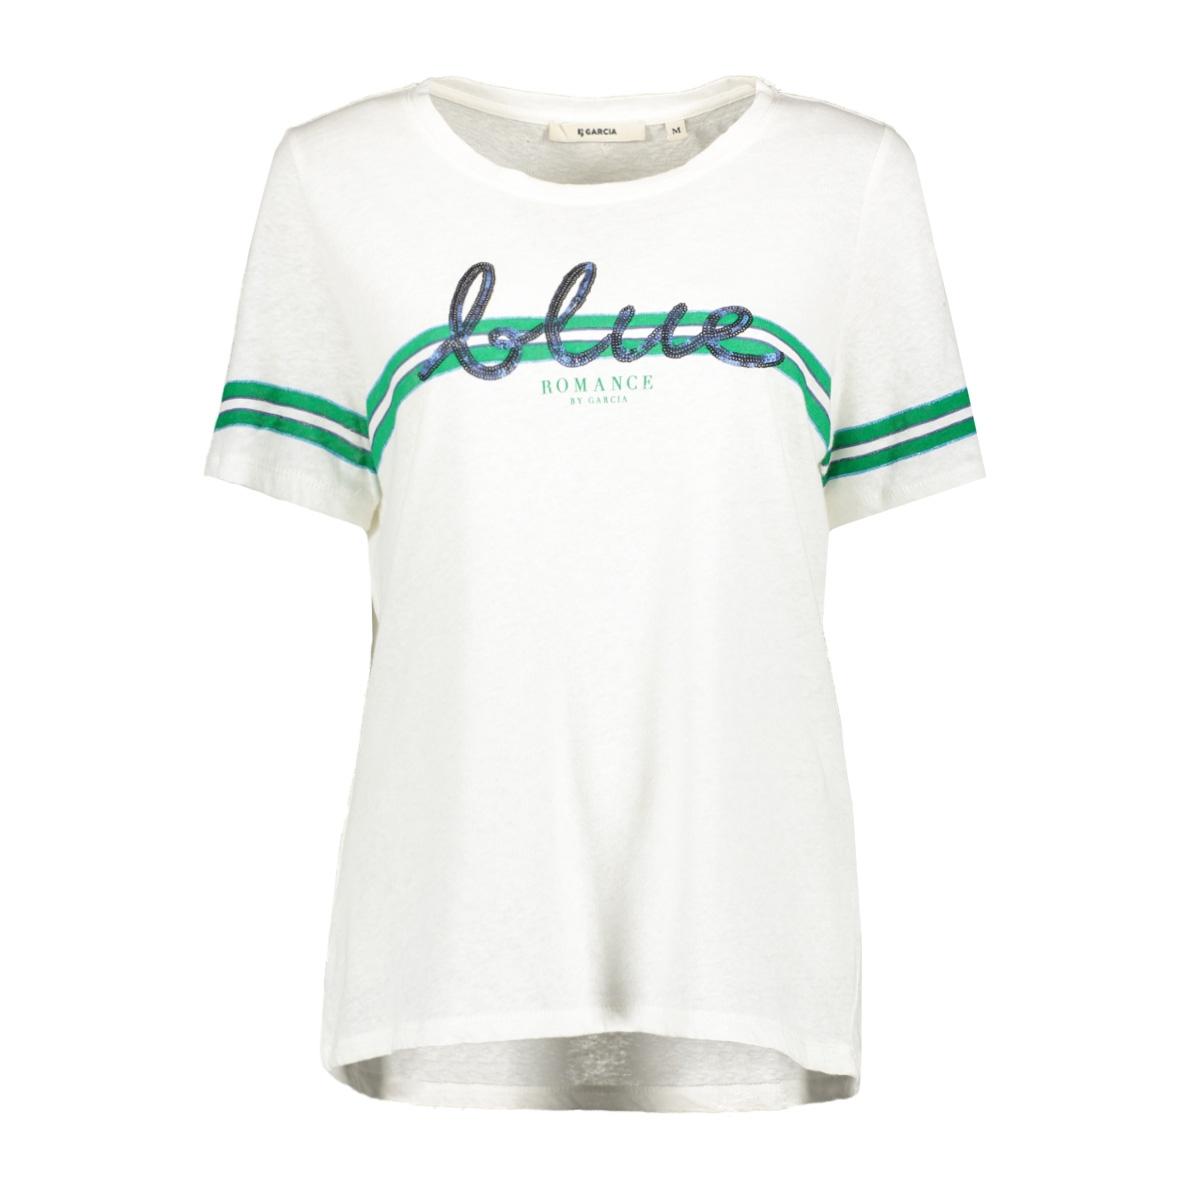 b90204 garcia t-shirt 53 off white